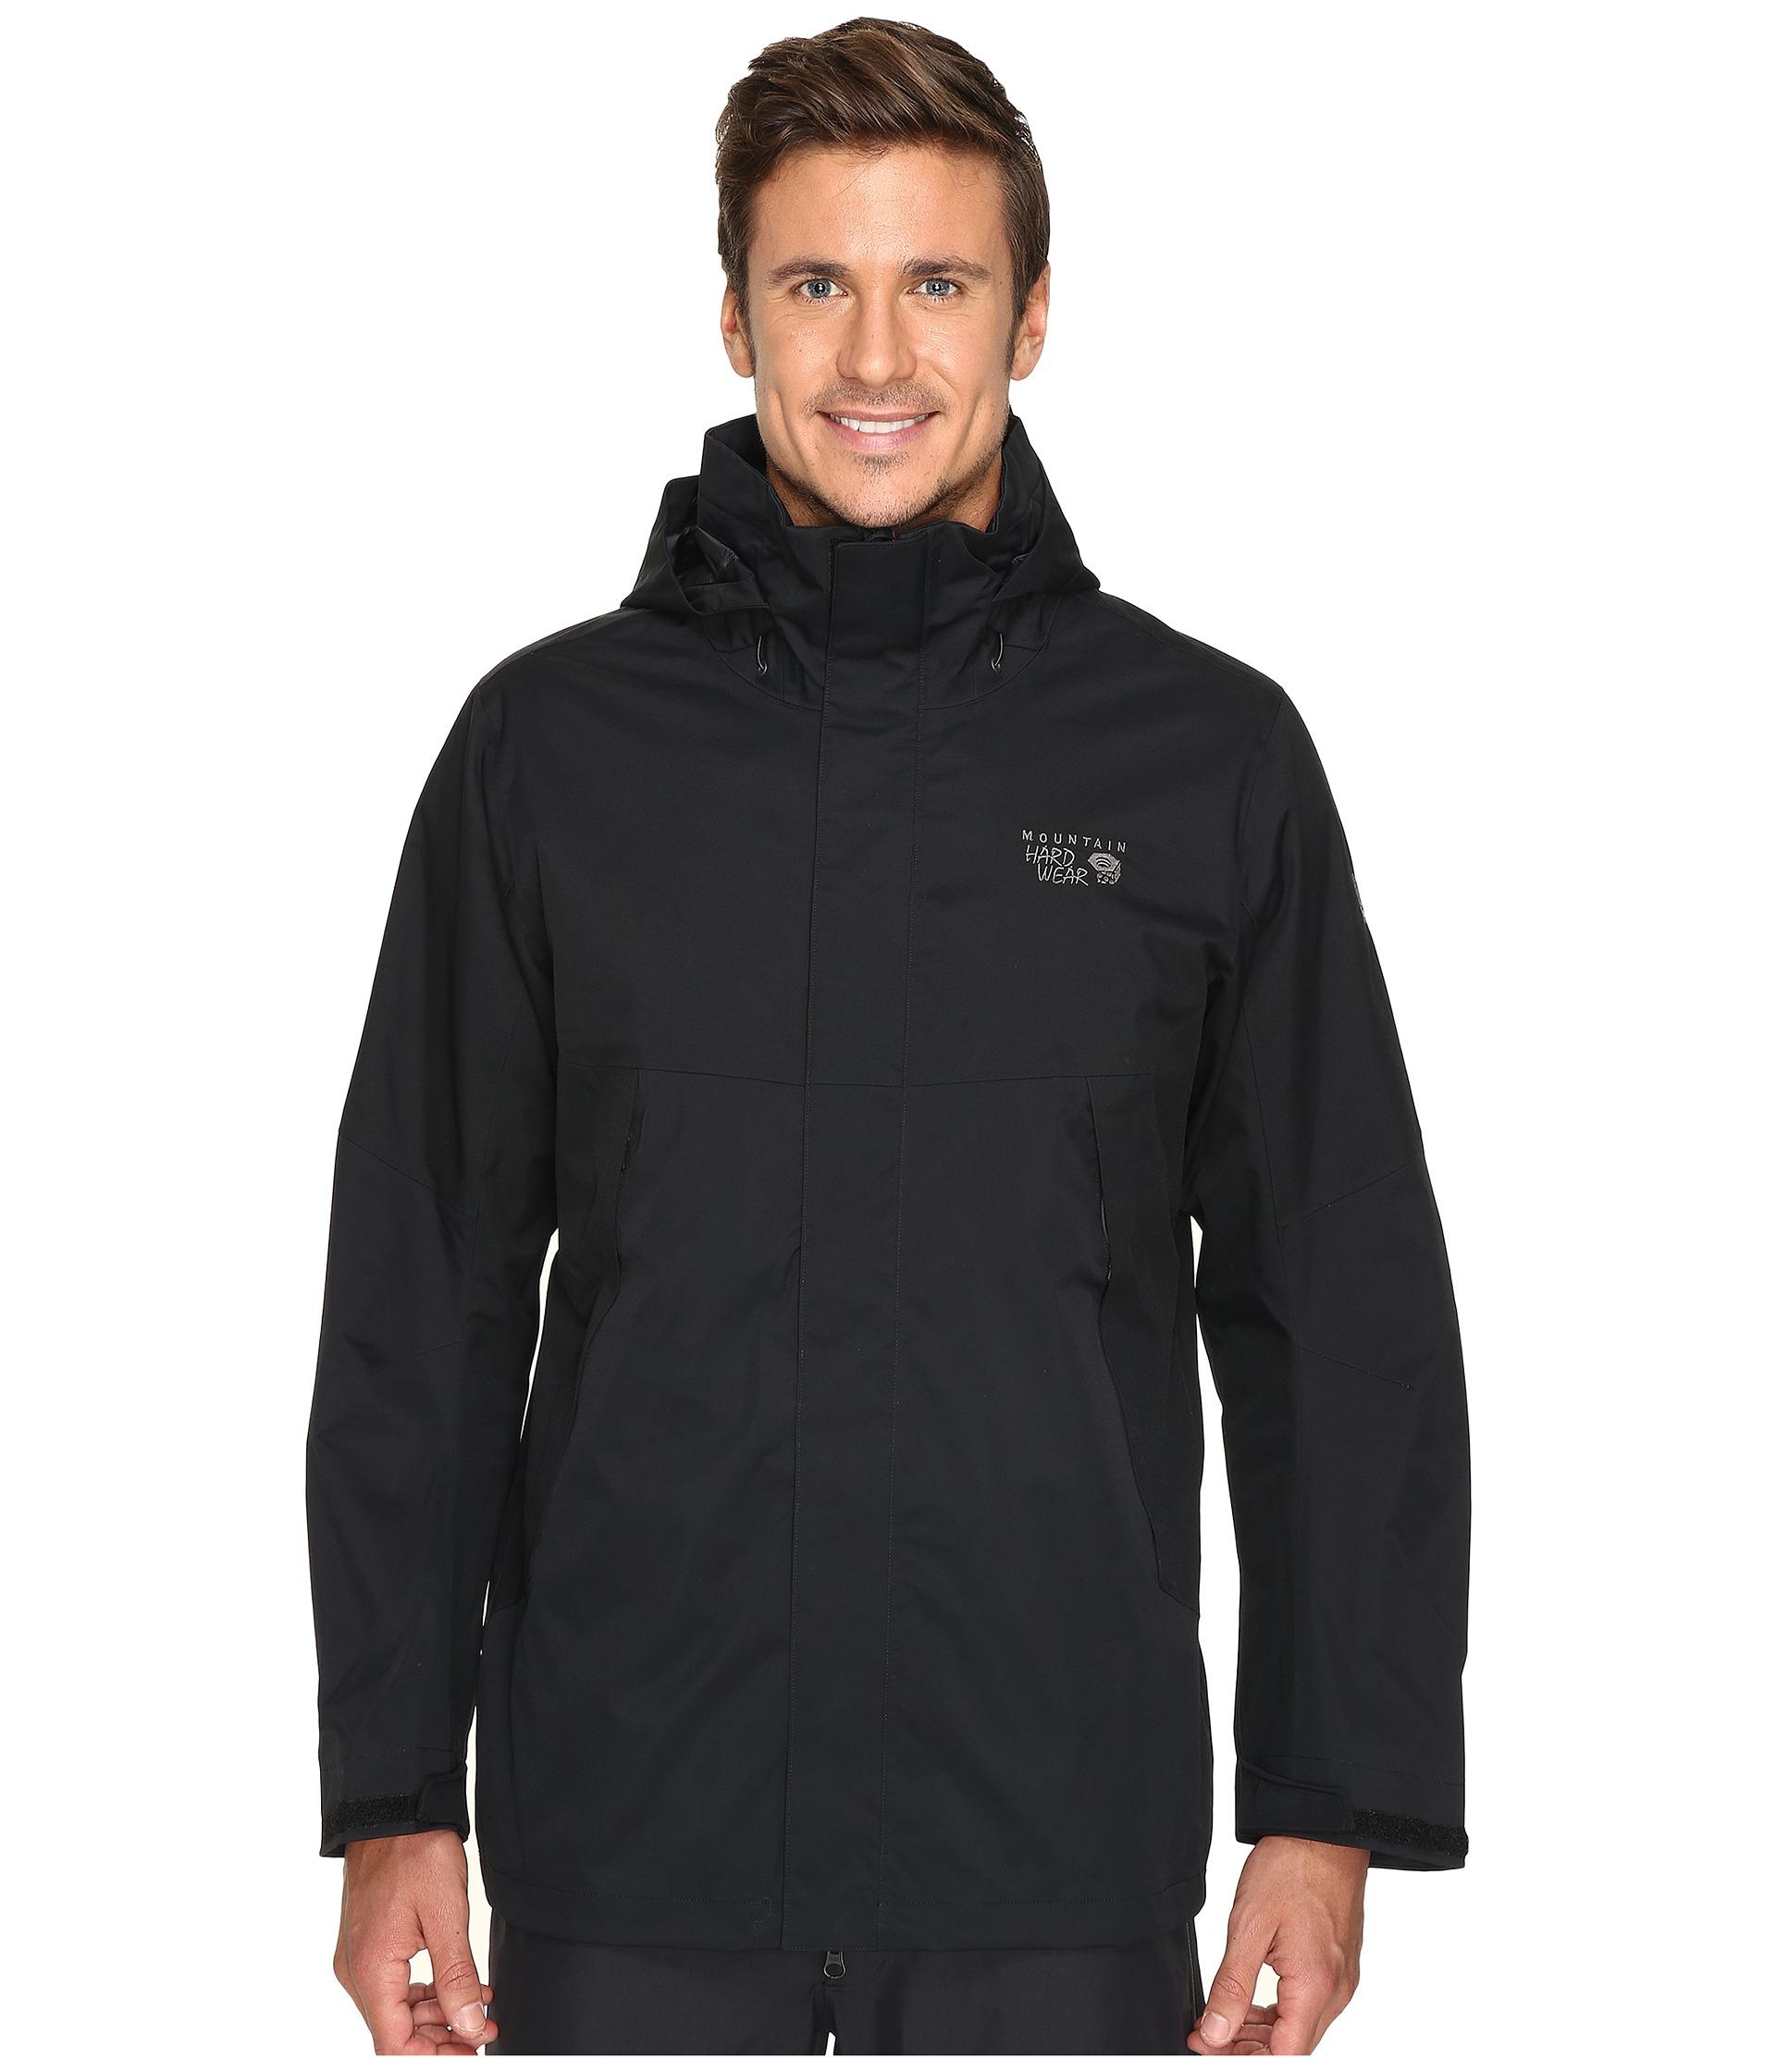 mountain hardwear exposure parka in black for men lyst